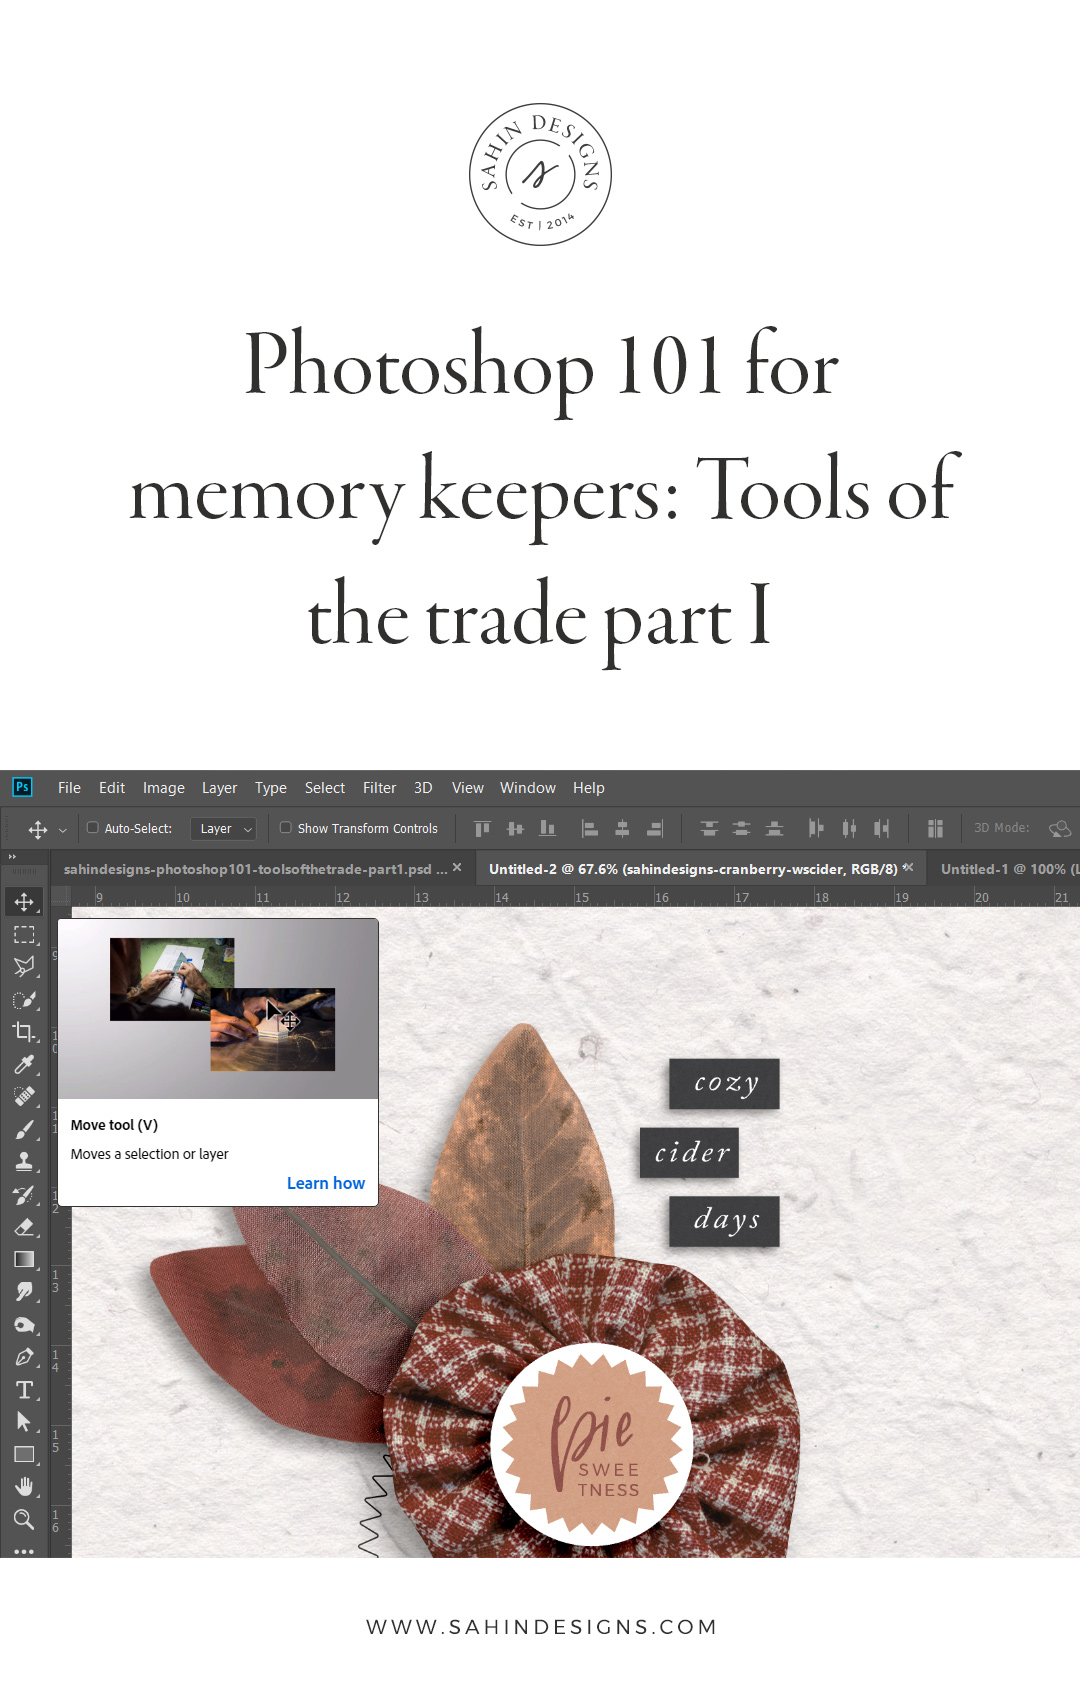 sahin designs, scrapbooking, digital scrapbooking, photoshop tutorial, scrapbook tutorial, photoshop for scrapbooking, memory keeping, learn digital scrapbooking